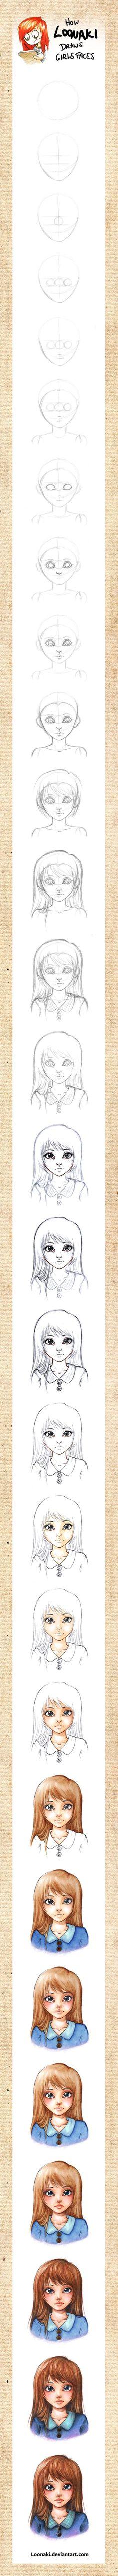 How Loonaki Draws Girls Faces by *Loonaki on deviantART